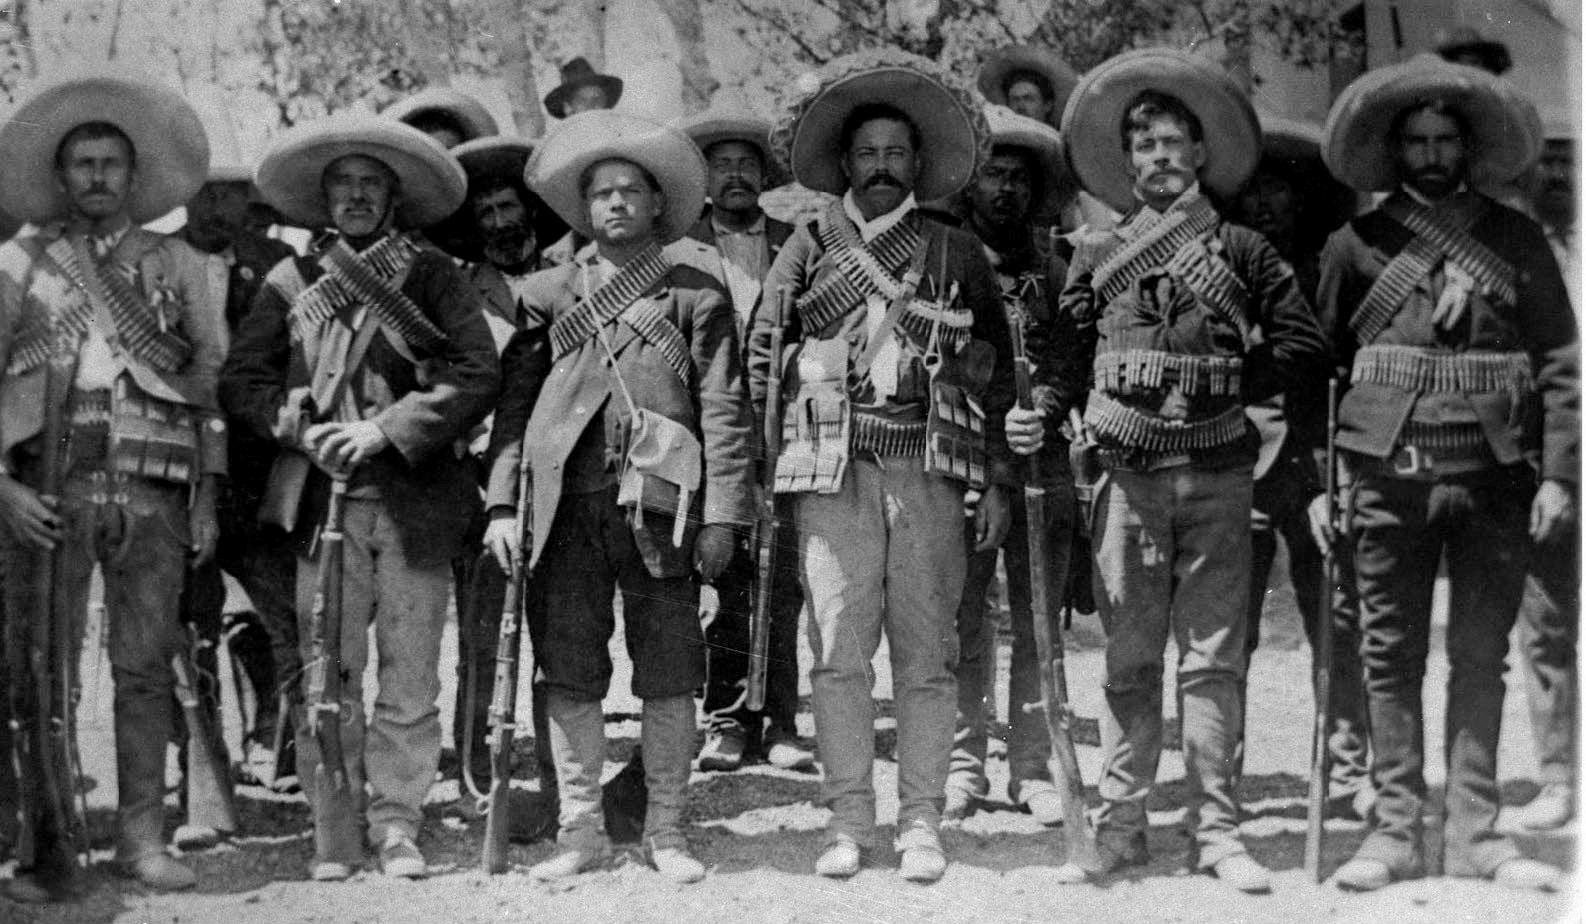 Resultado de imagen para revolución mexicana